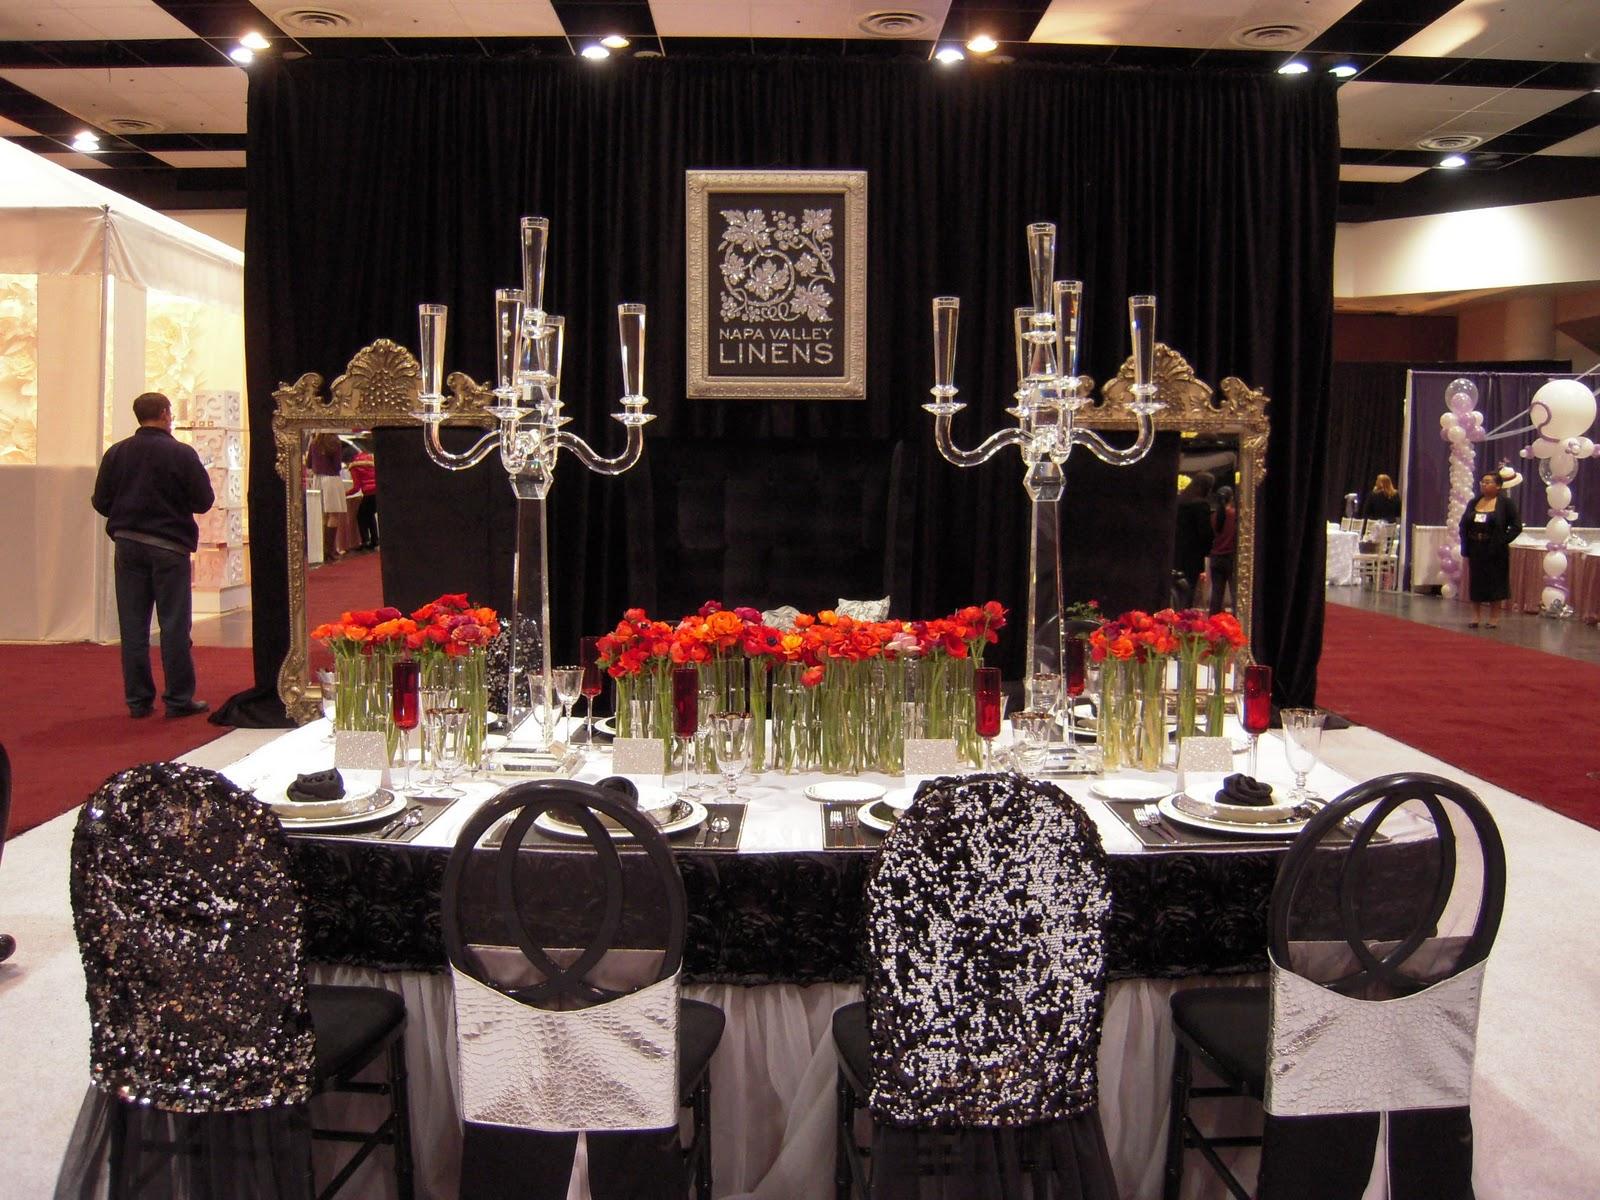 Enchanting Events: Enchanting Events Blog: My Day At The Wedding Symposium